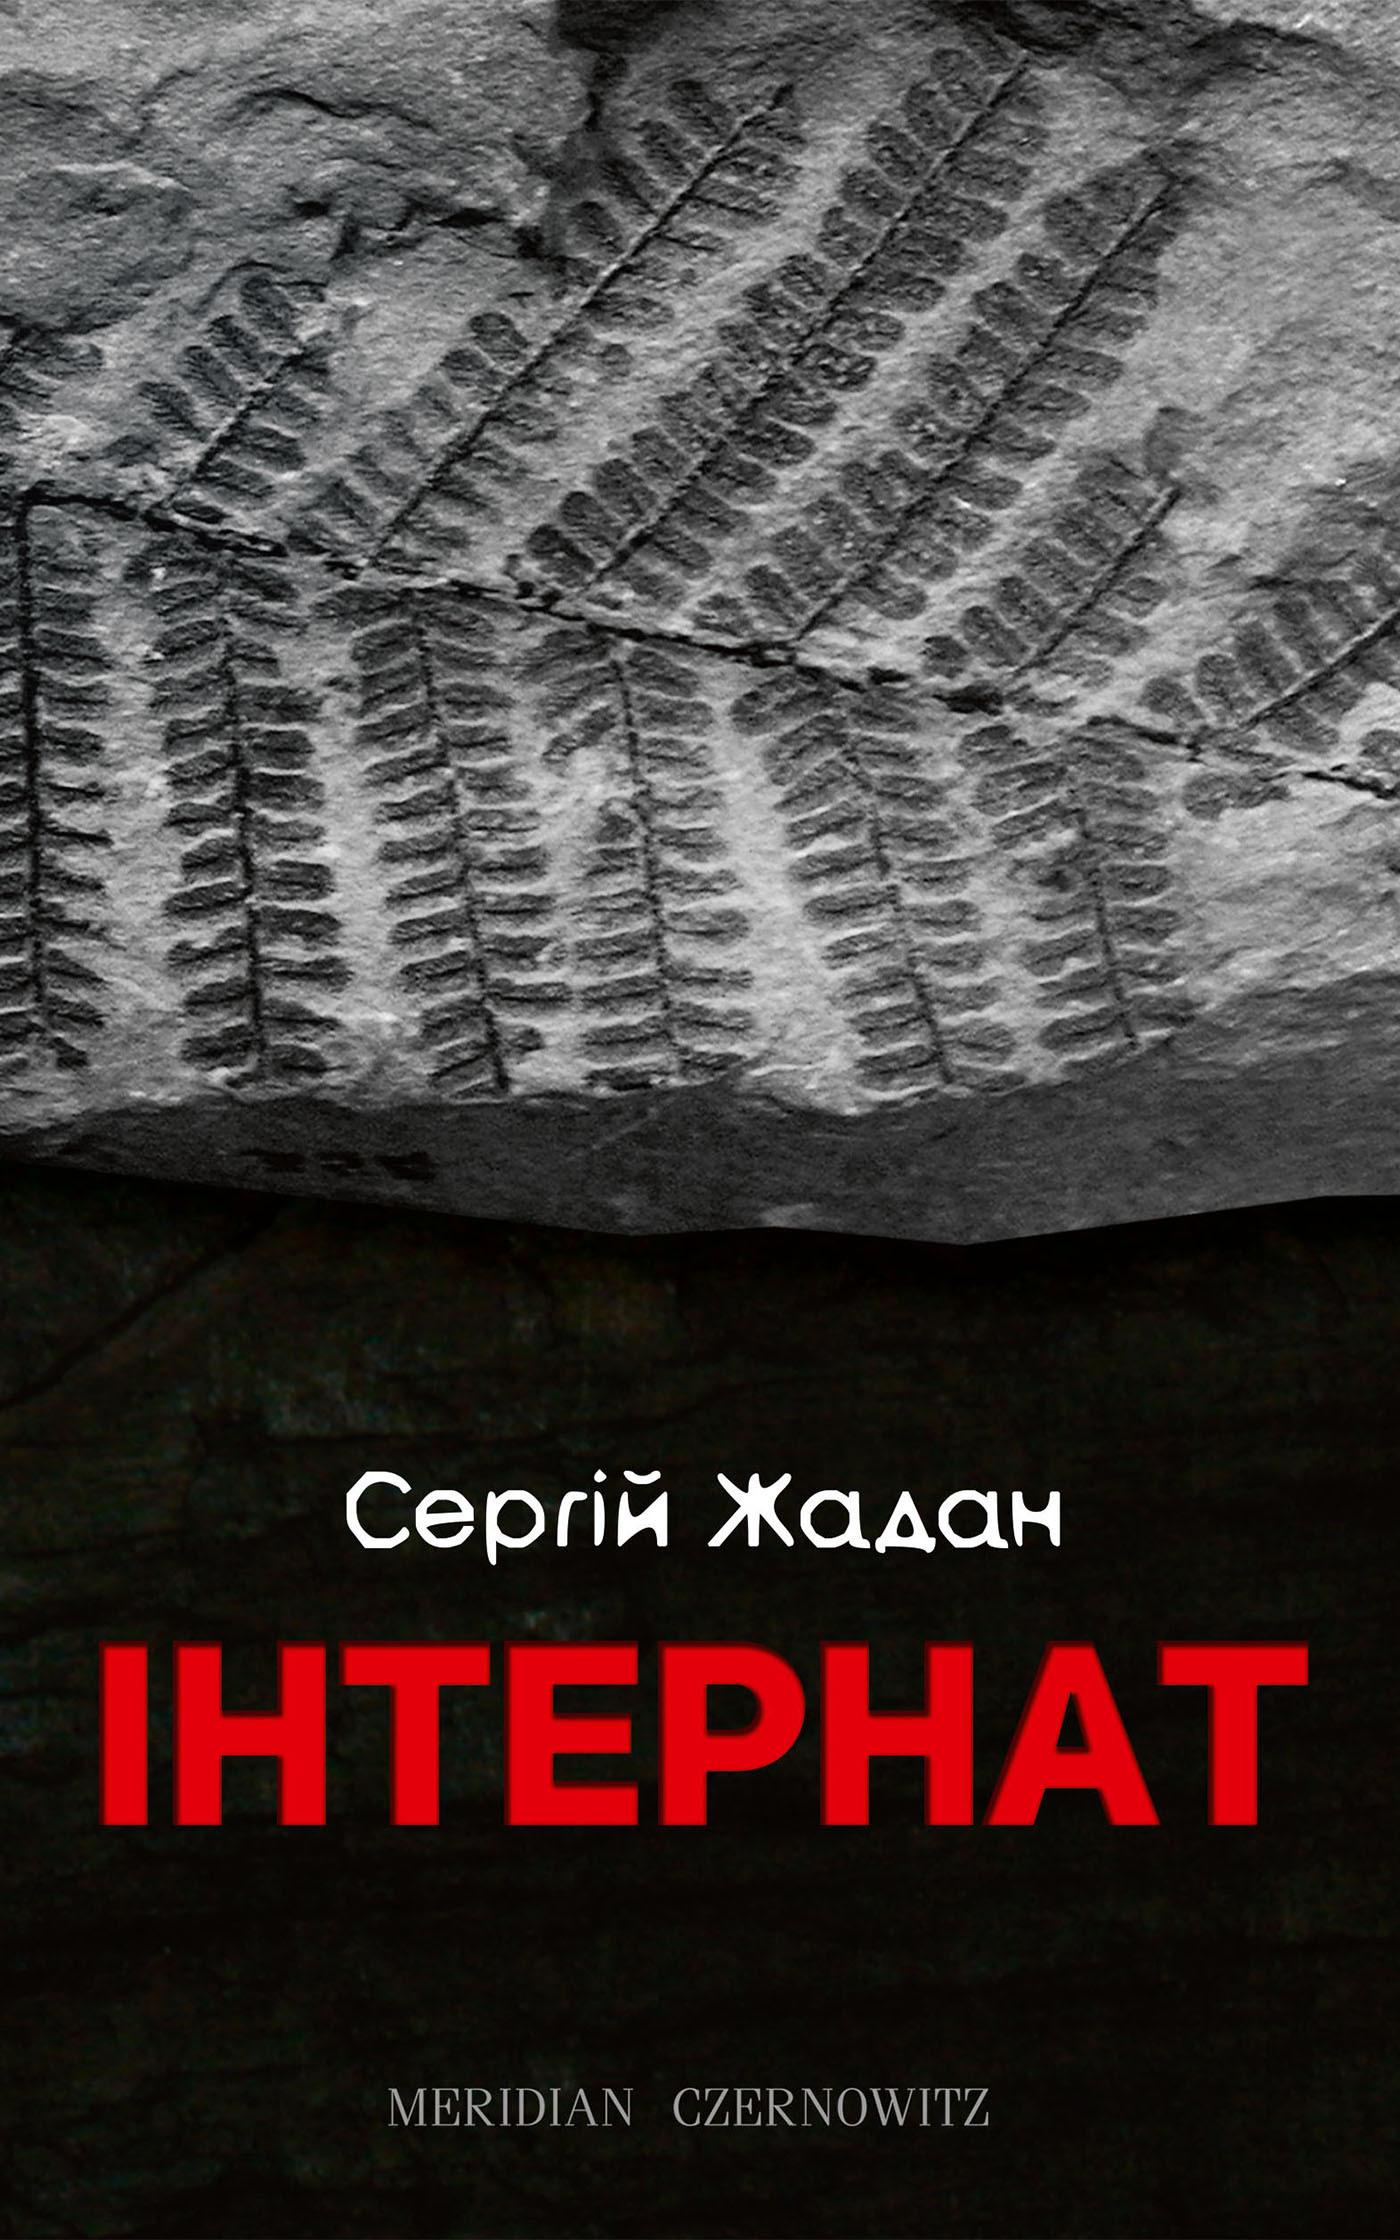 Сергій Жадан Інтернат жадан с в ворошиловград